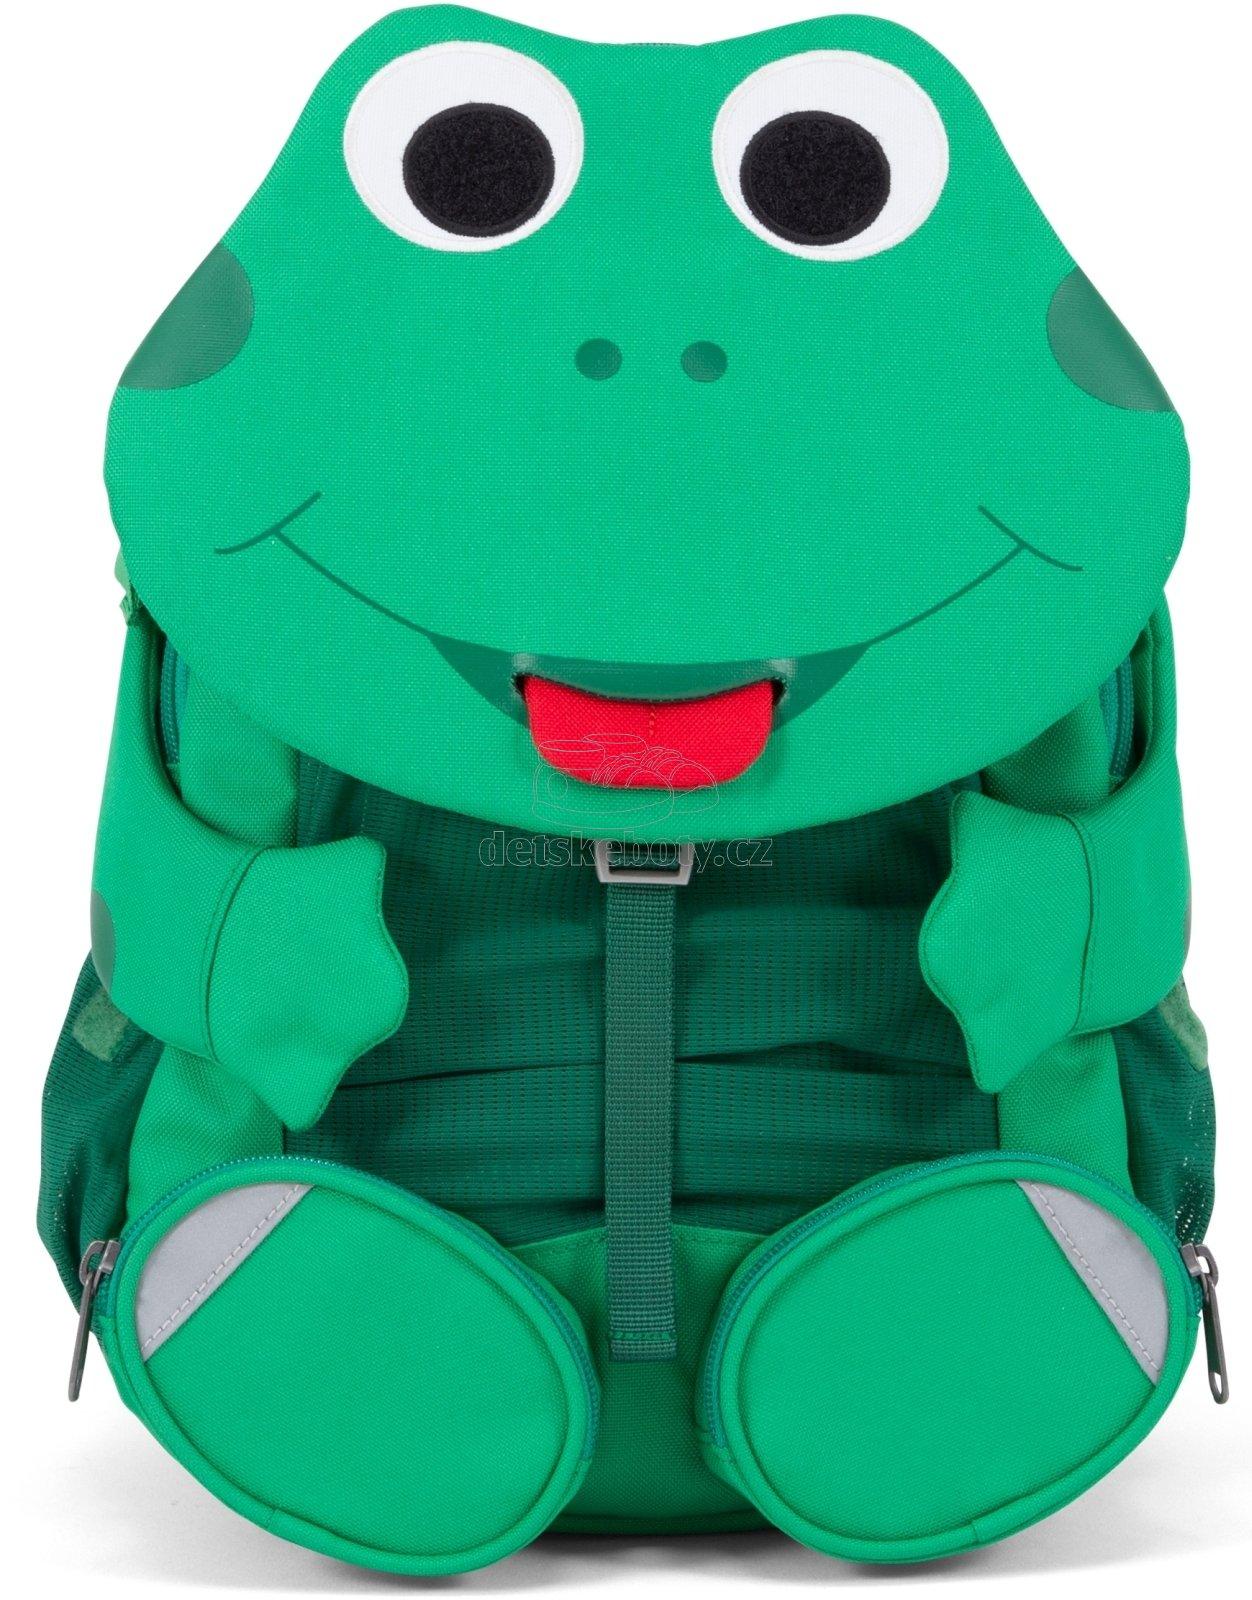 Detský batoh do škôlky Affenzahn Fabian Frog large - green